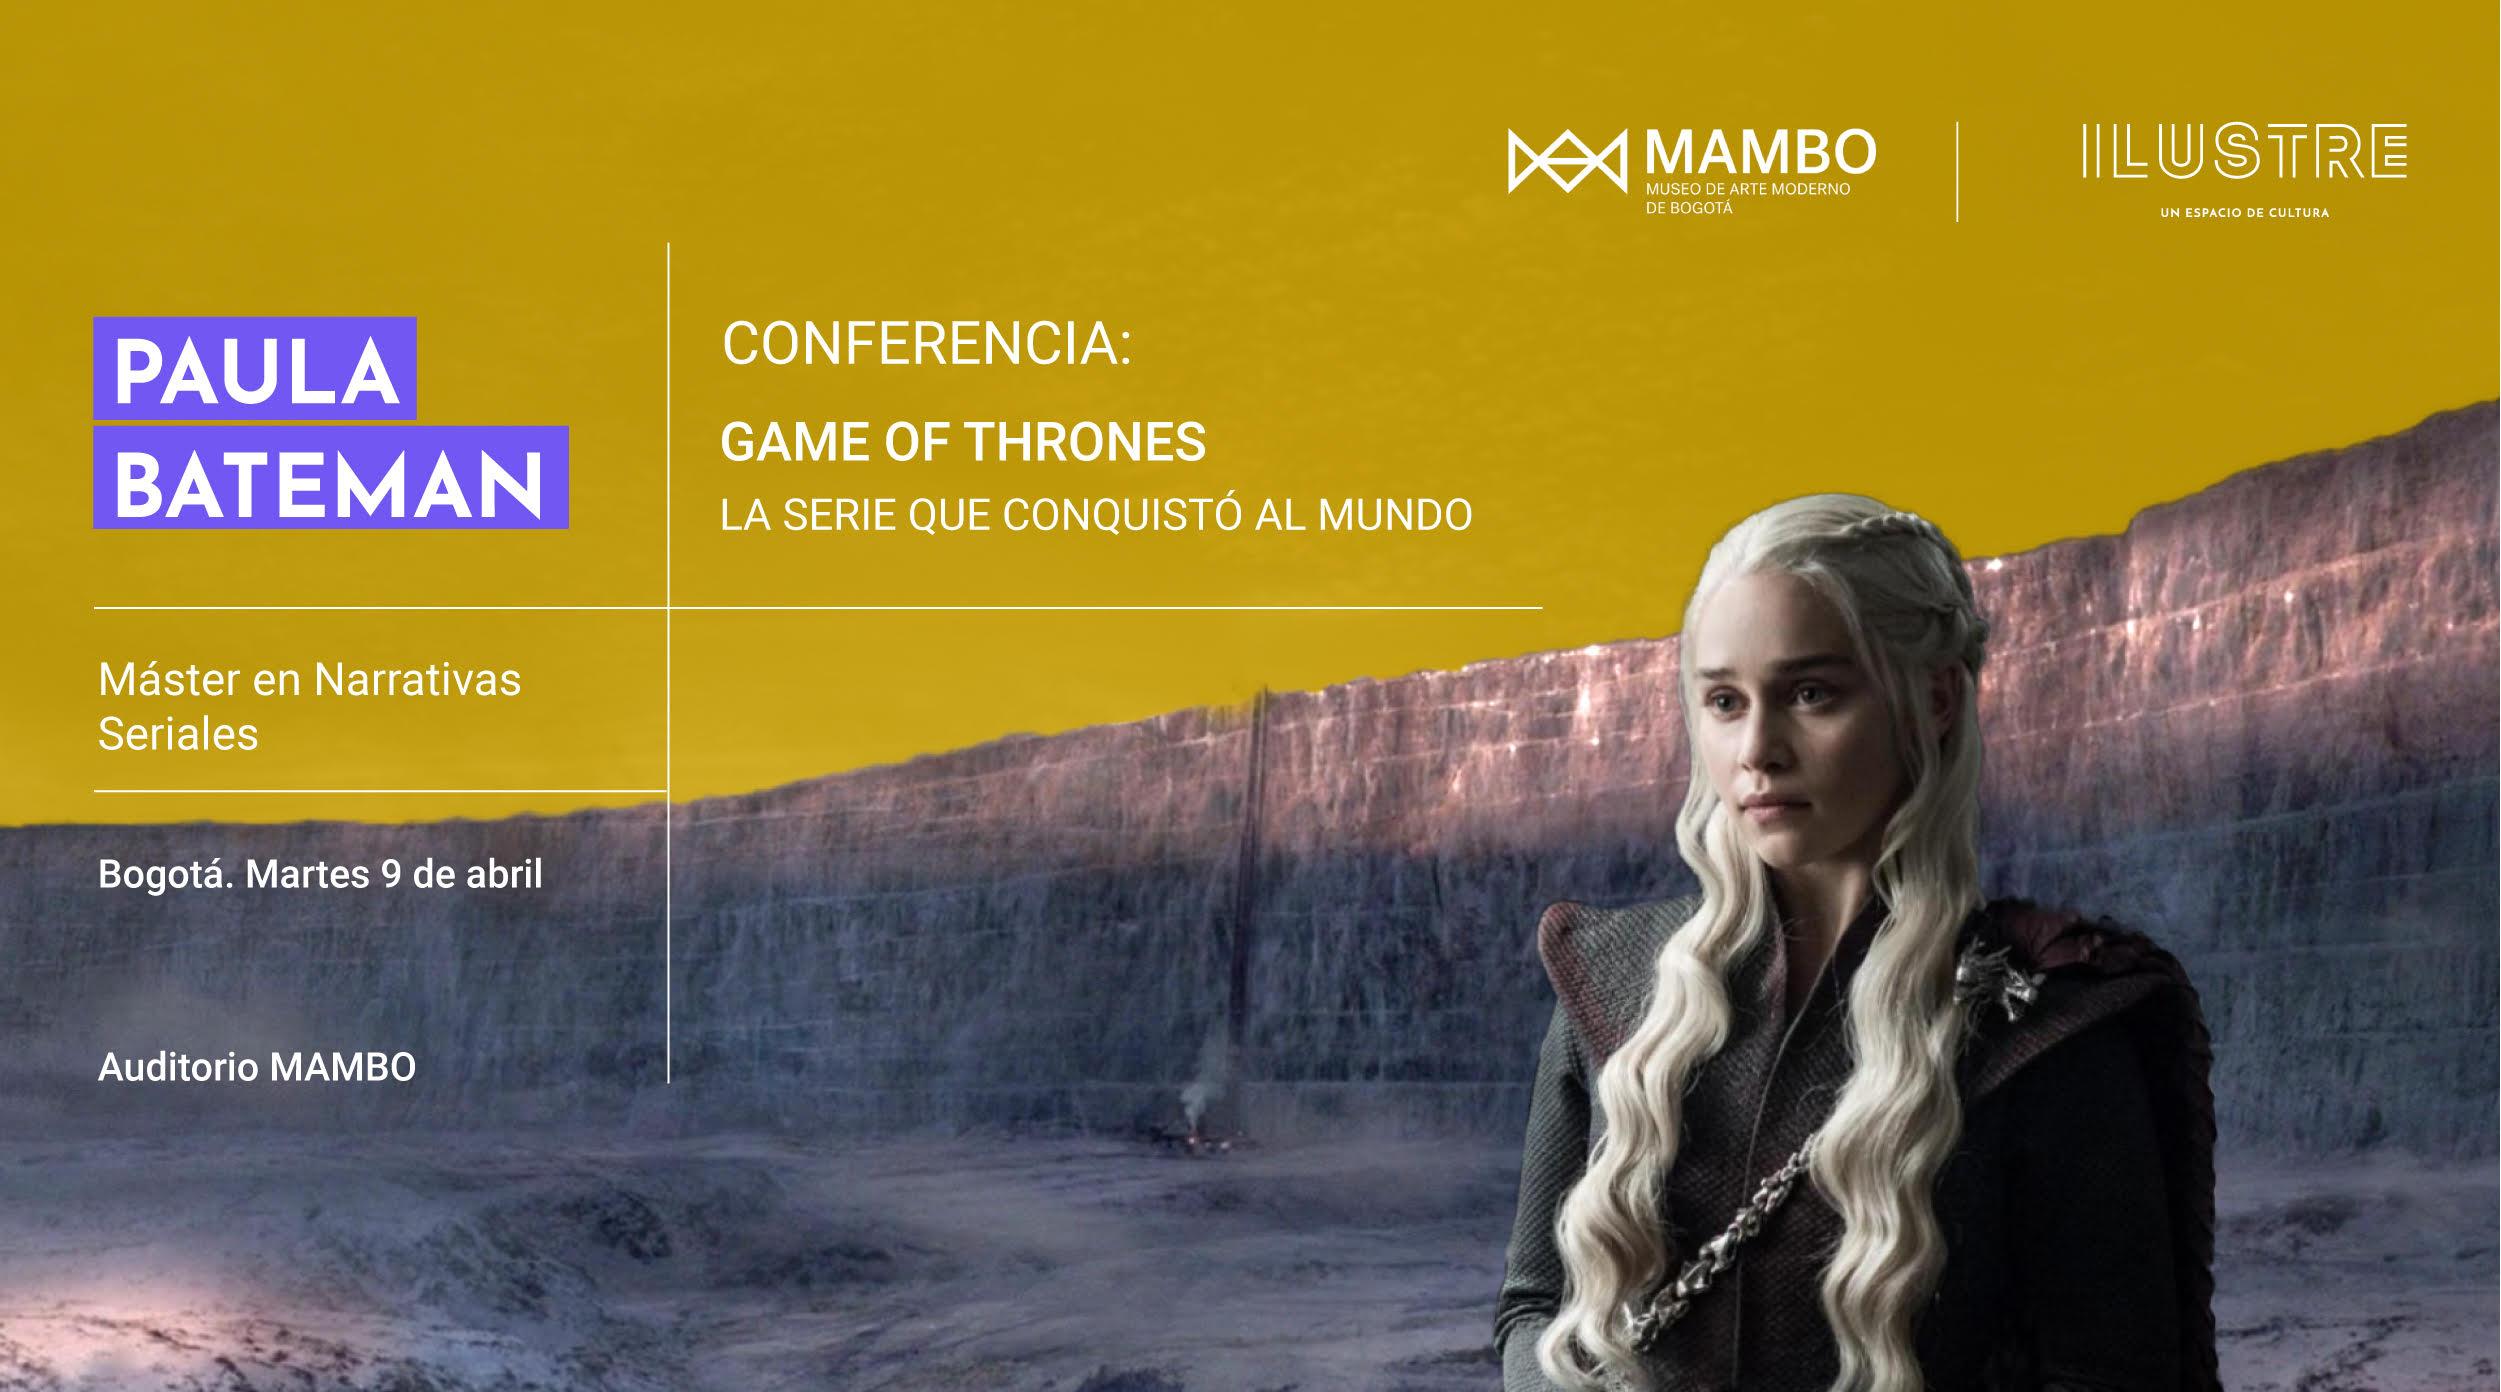 Game of Thrones: la serie que conquistó al mundo